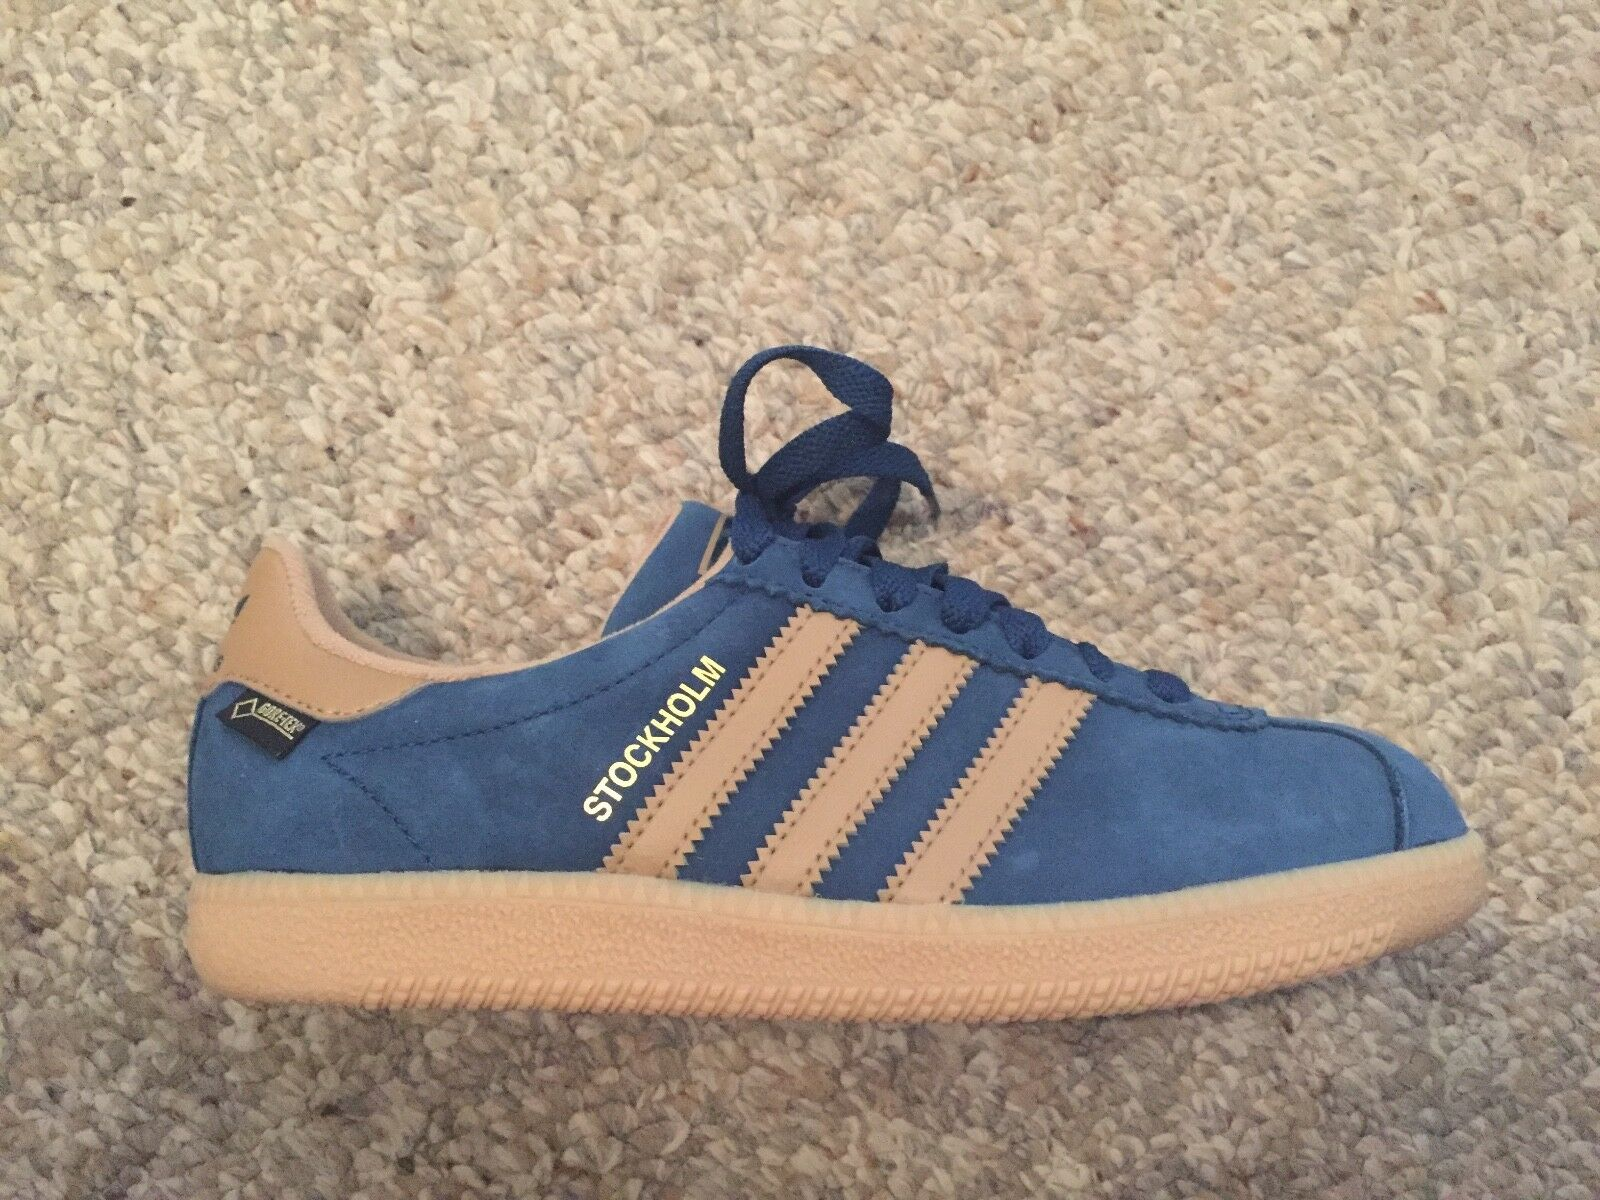 Adidas Stockholm Gore-tex bluee Size US 4 4 4 12  UK 4 cf1f6b